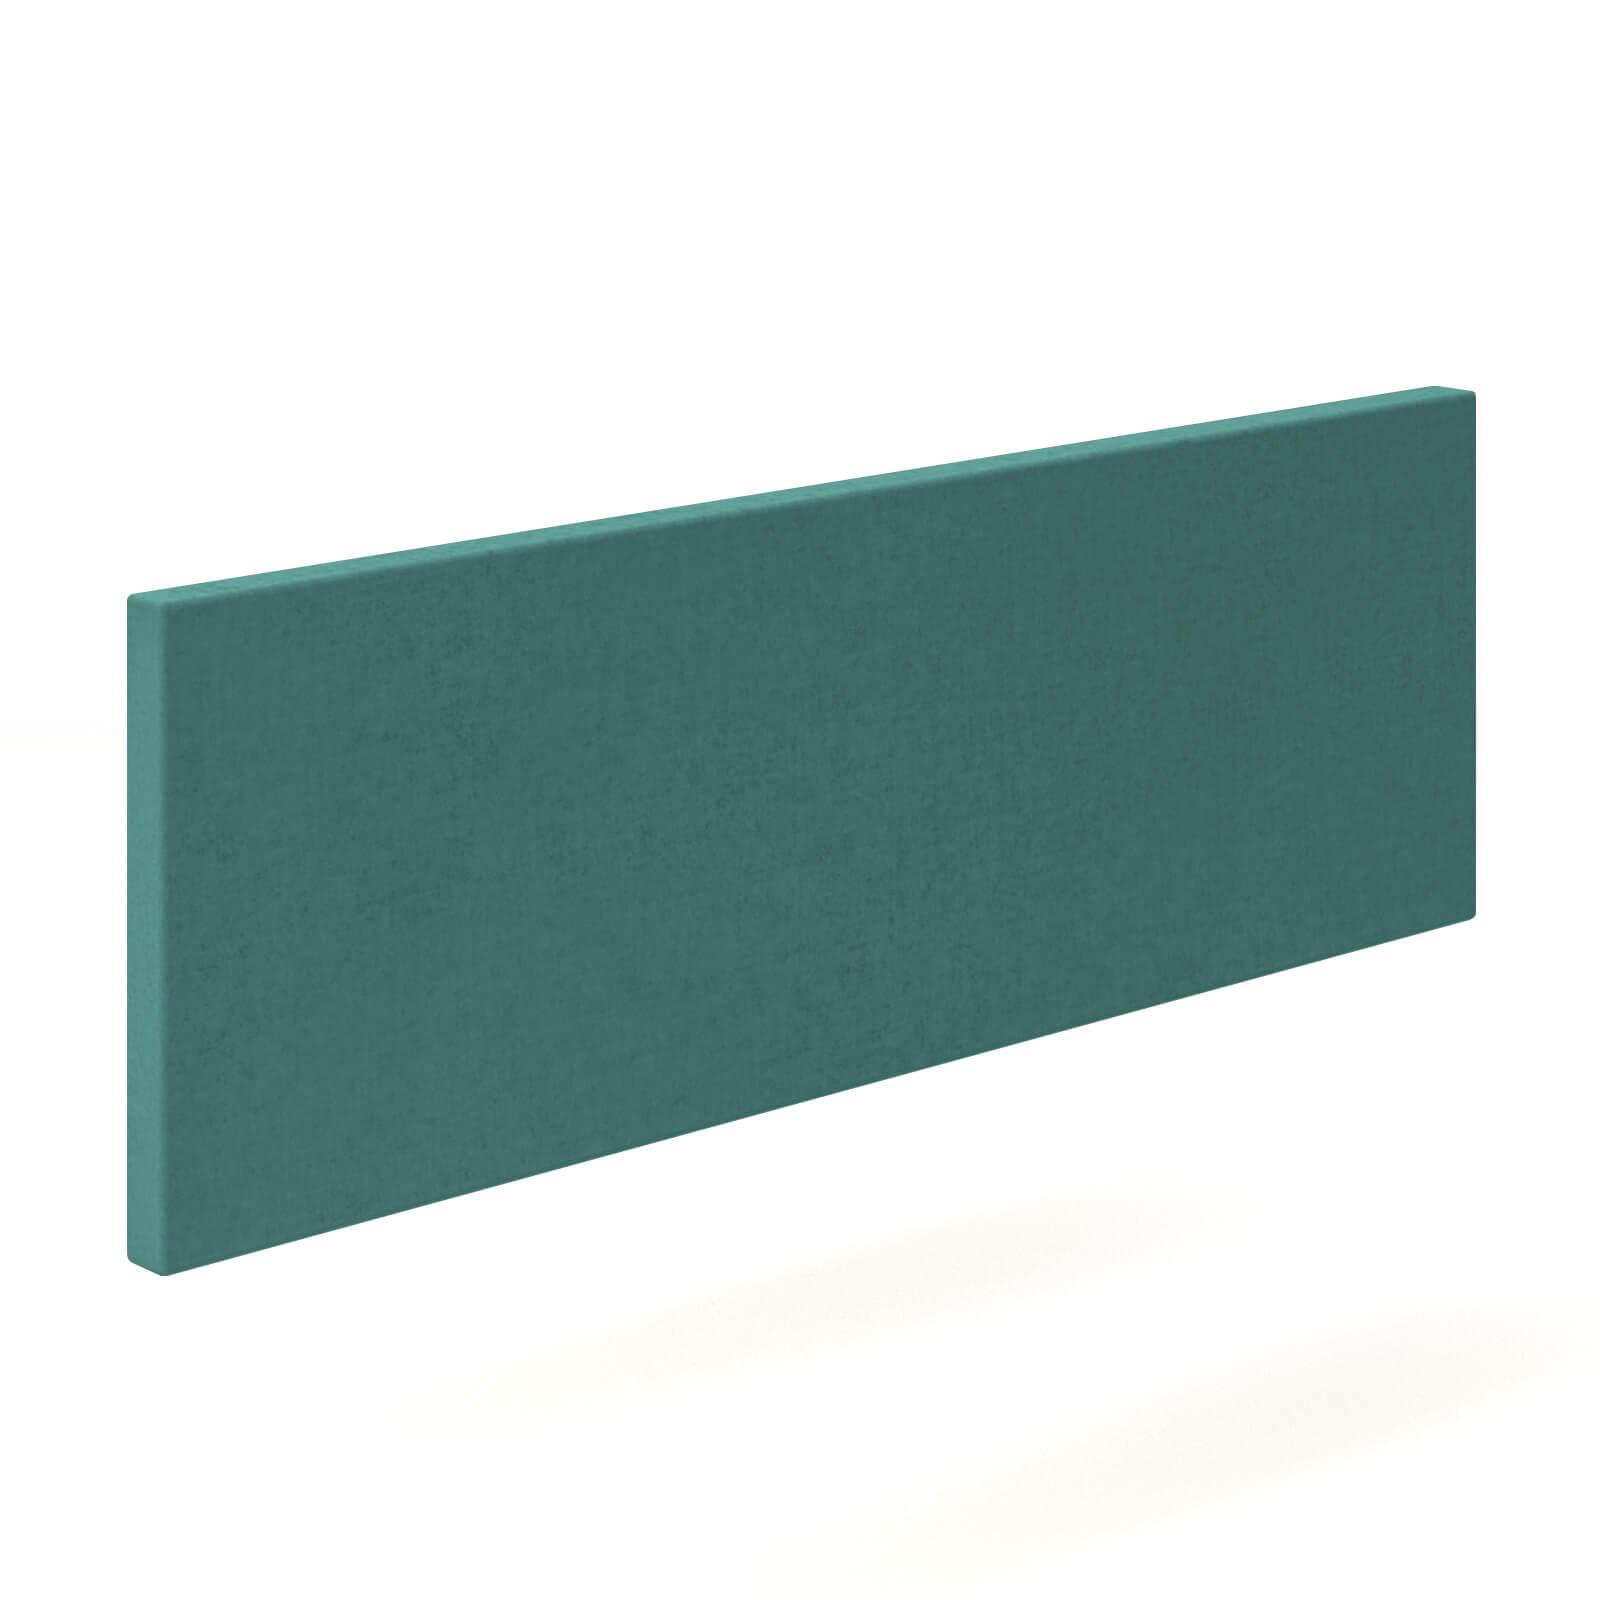 Akustik Wandverkleidung MODUS 1.200 x 400 mm Akustikplatten Wandpaneele Filz